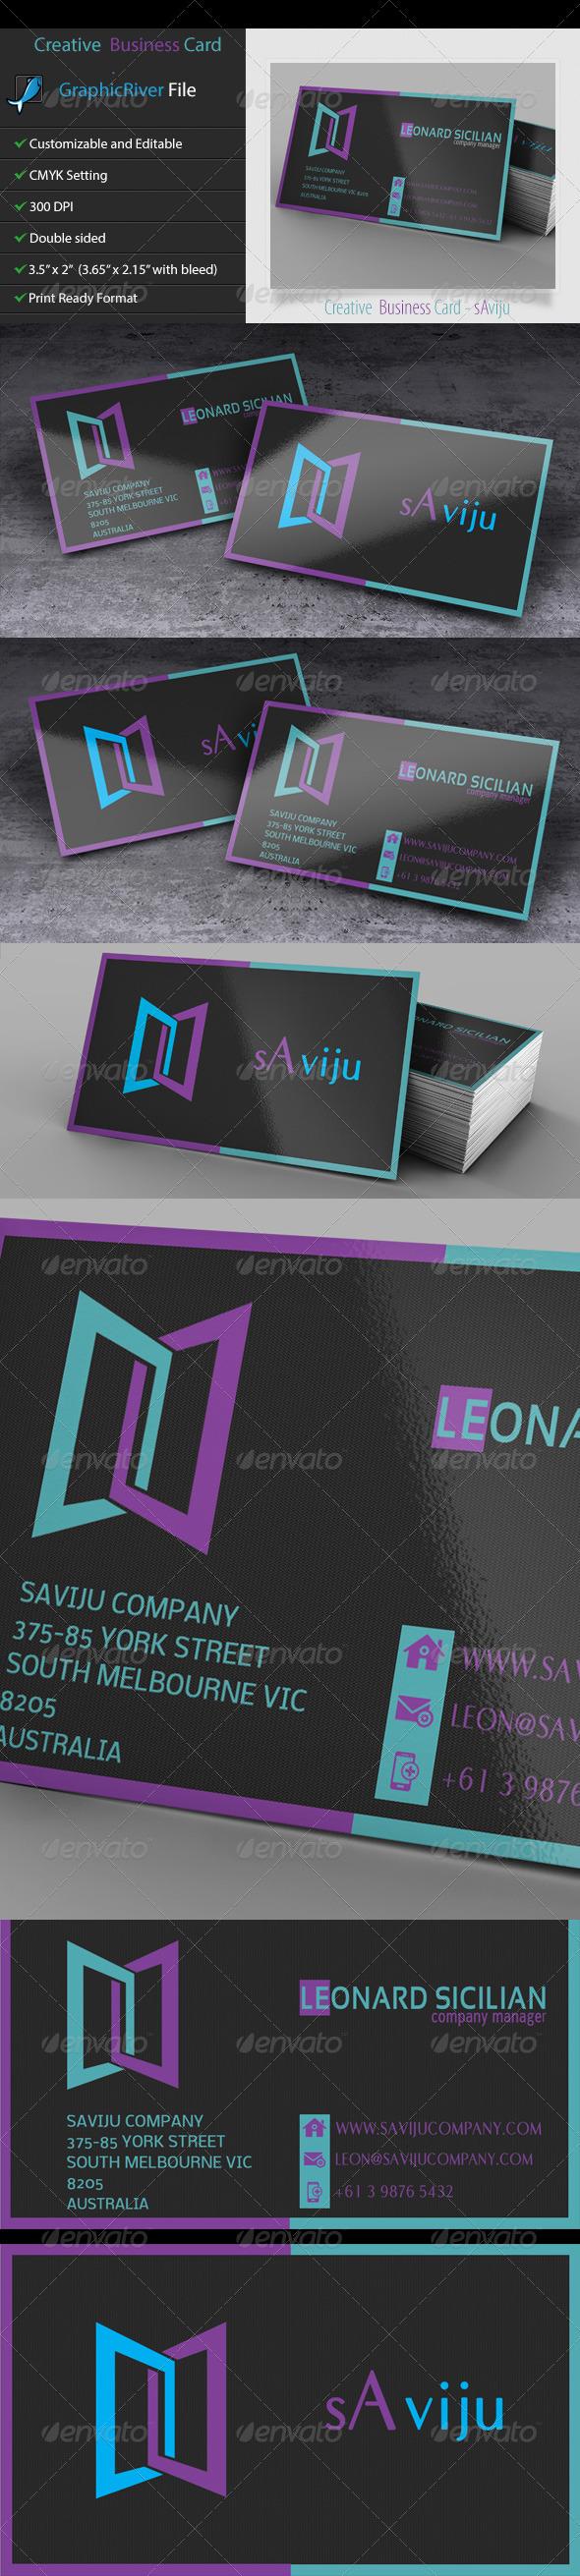 GraphicRiver Creative and Unique Business Card 3 sAviju 5320071